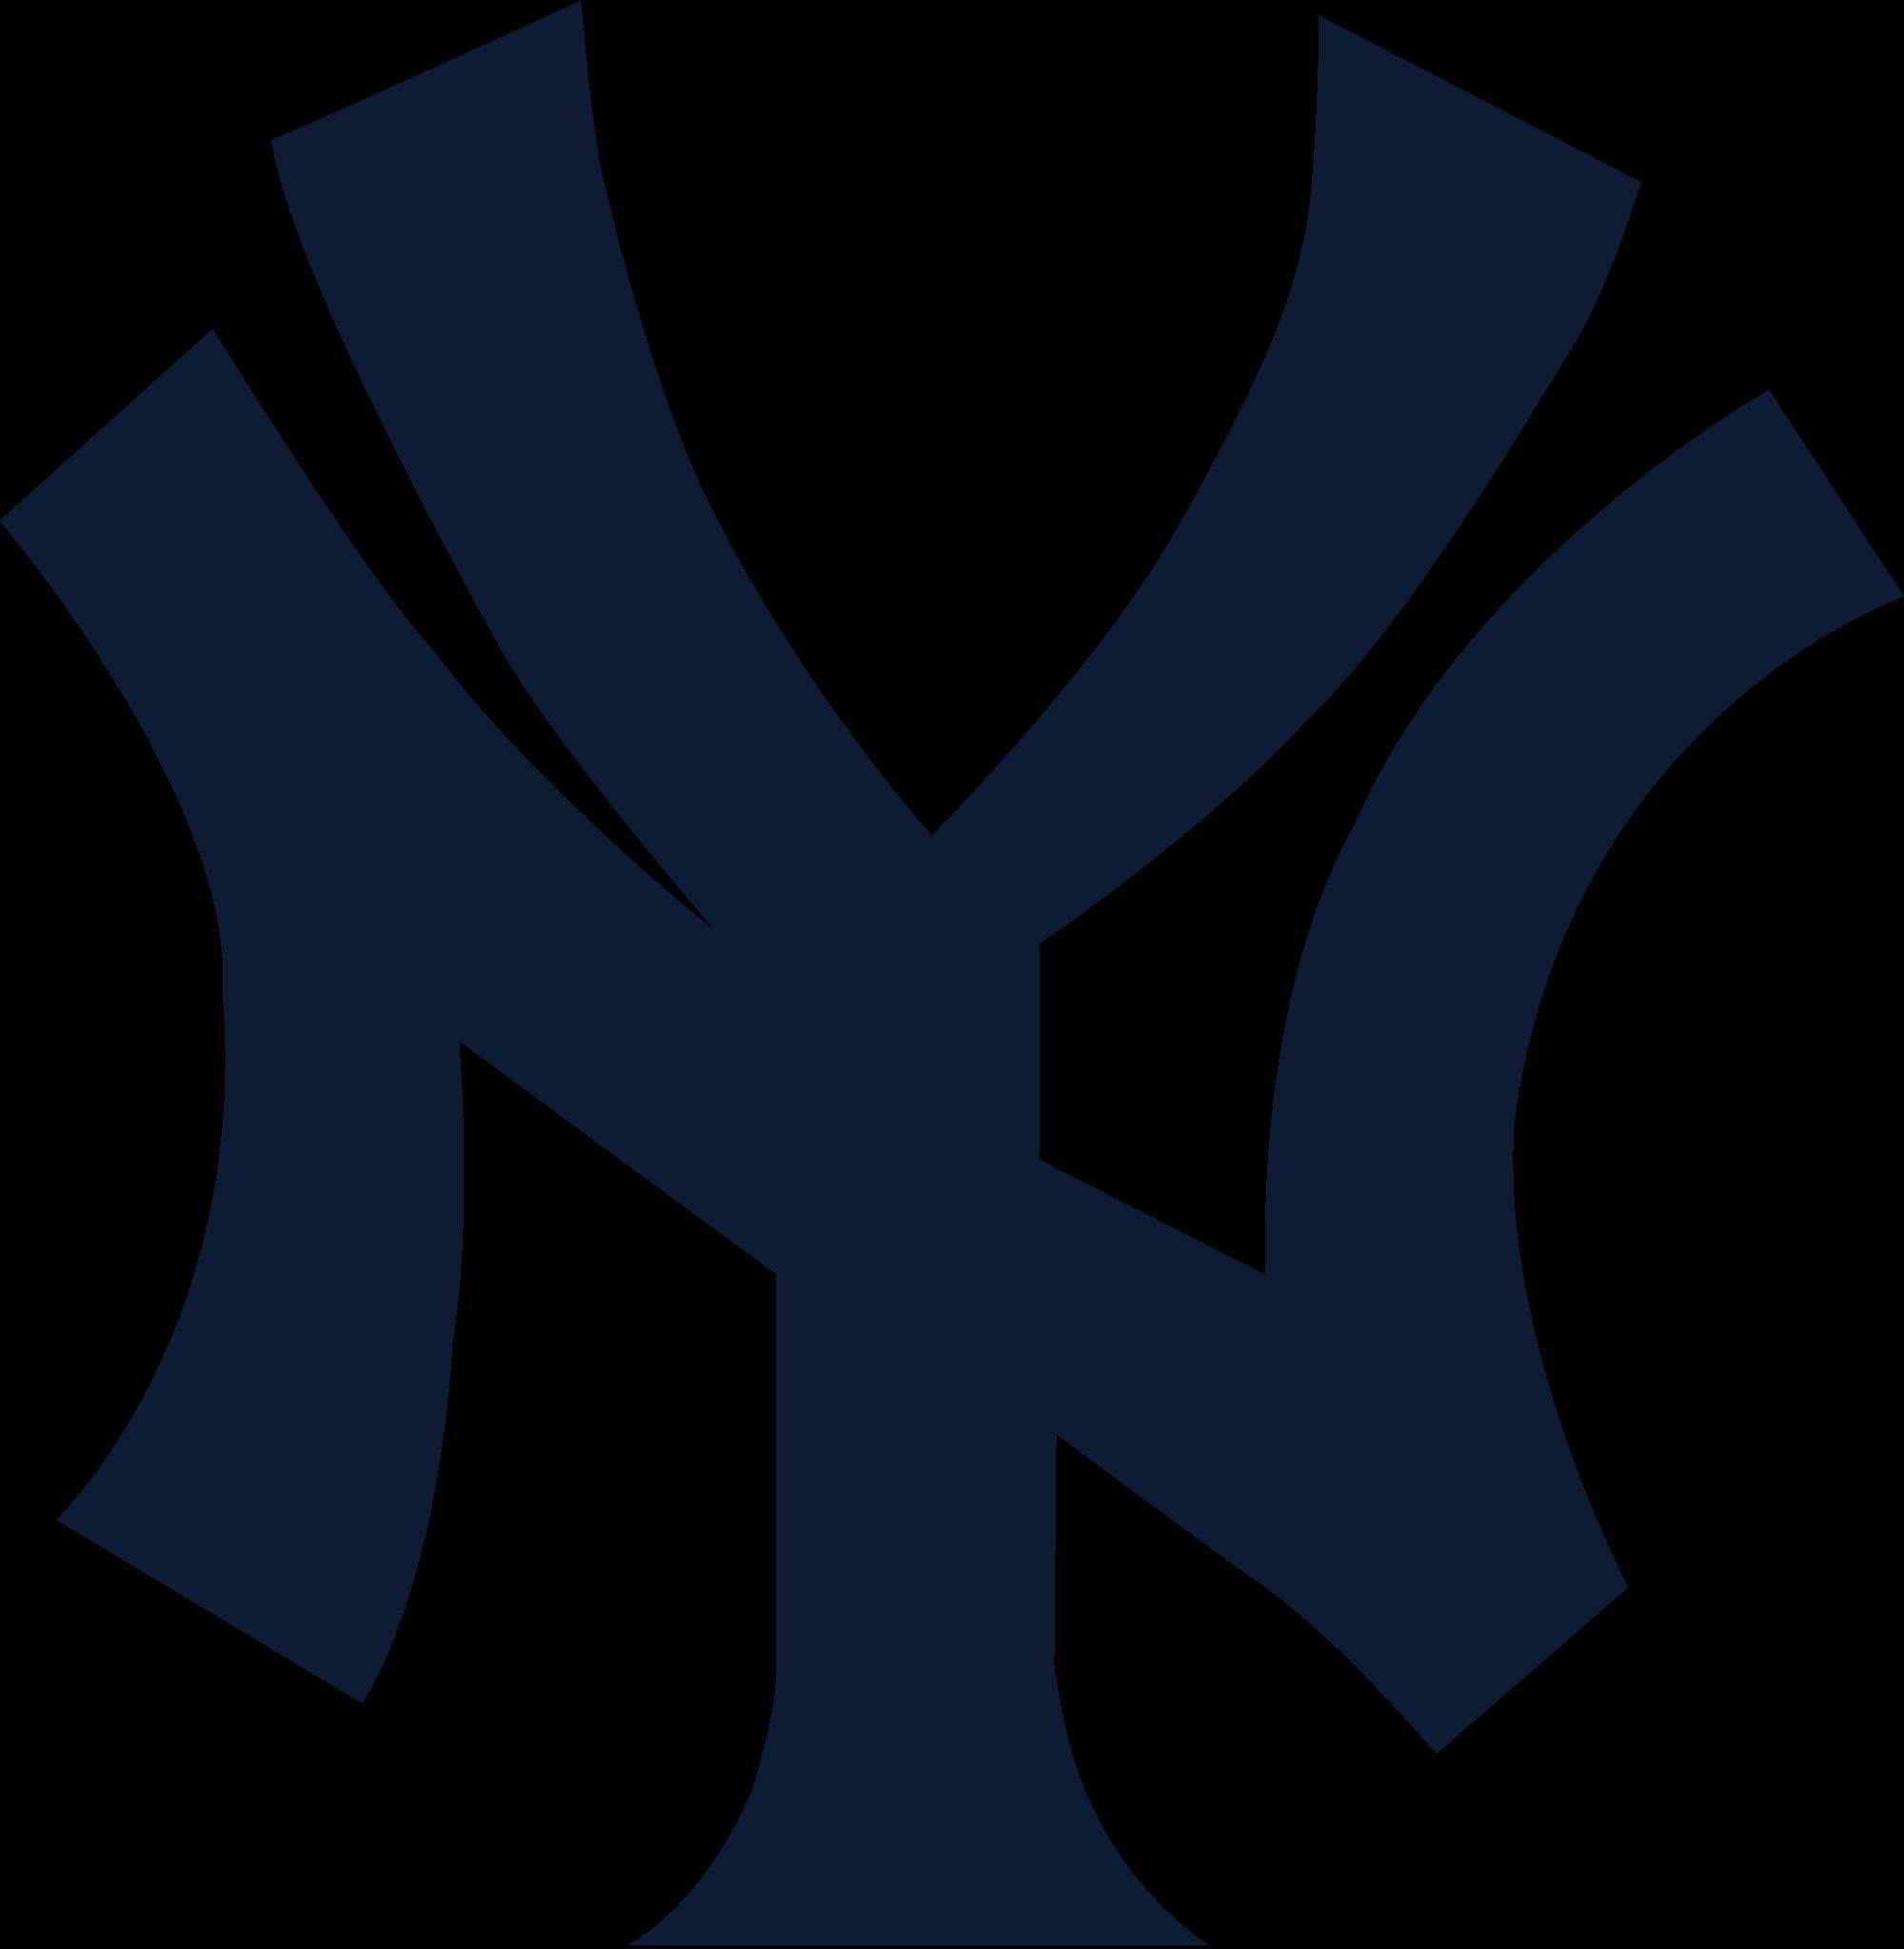 Yankee baseball clipart banner stock File:NewYorkYankees JerseyLogo.svg - Wikimedia Commons banner stock